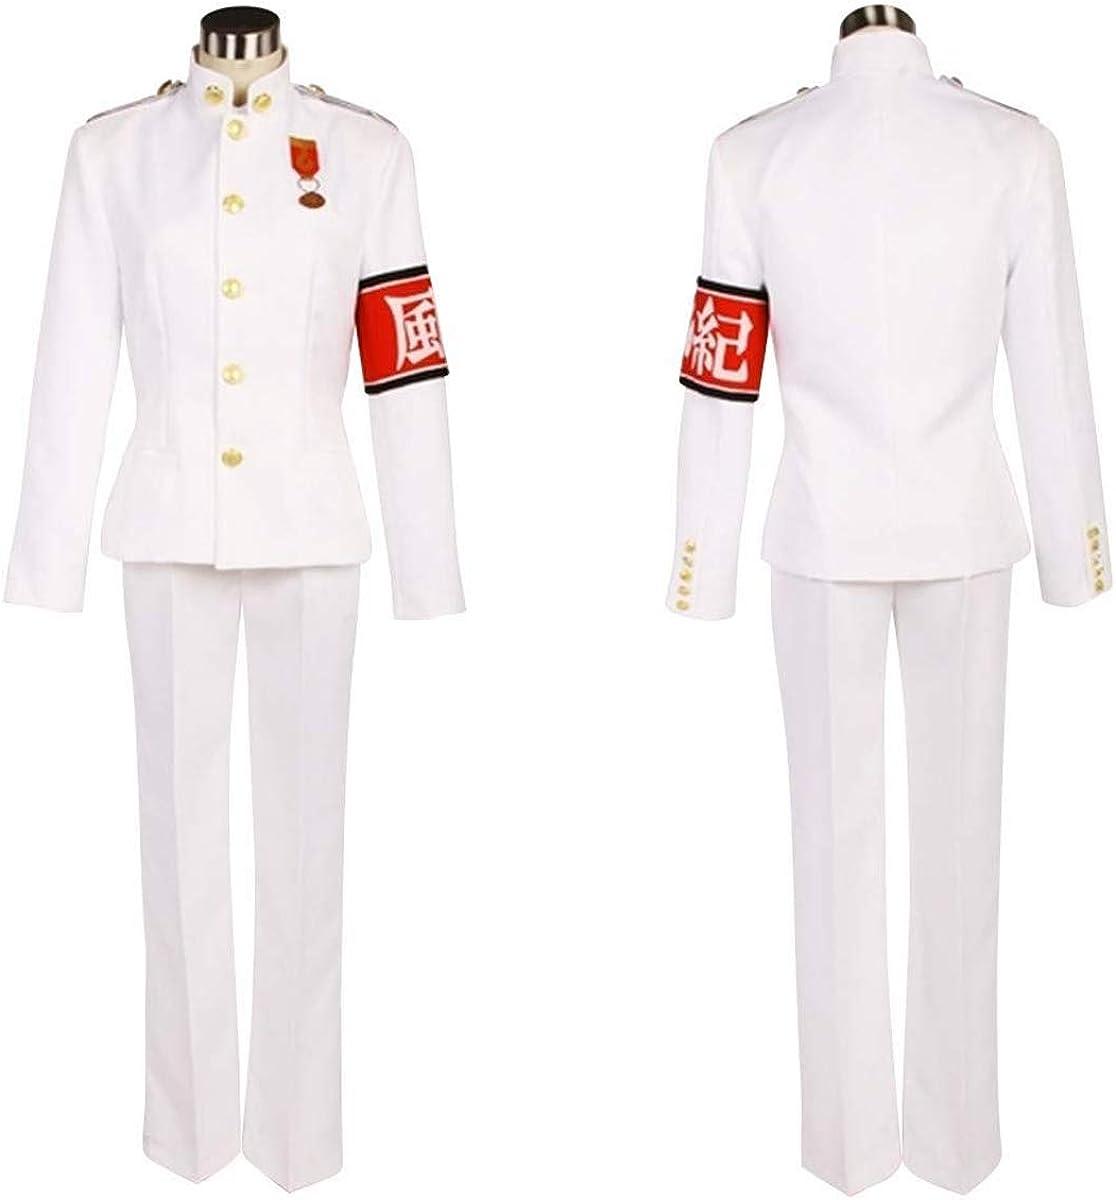 Amazon.com: Kiyotaka Ishimaru Kiyondo White Uniform Suits Outfit Cosplay Cosutme: Clothing